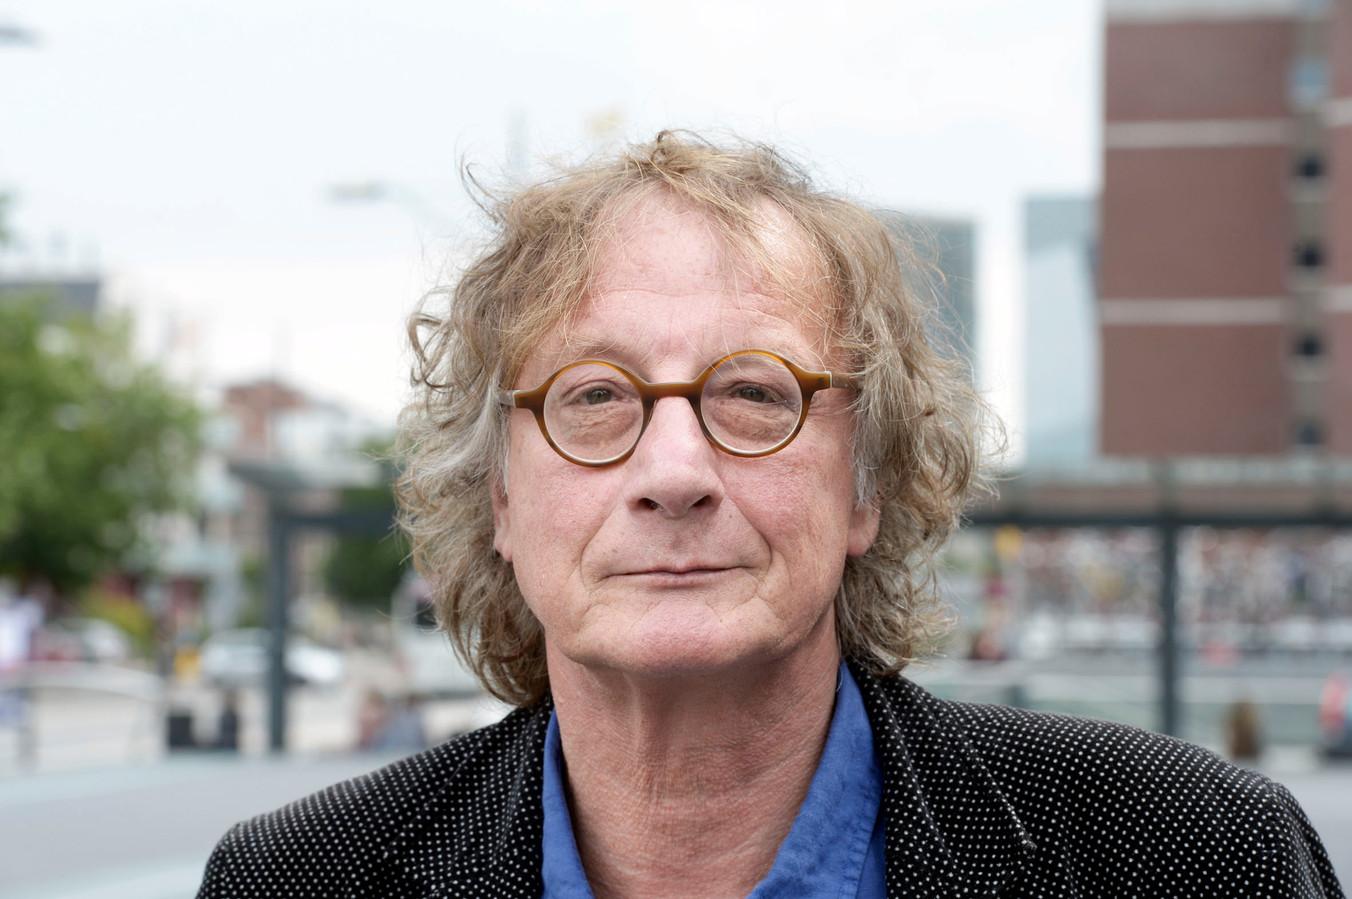 Columnist Thomas Verbogt